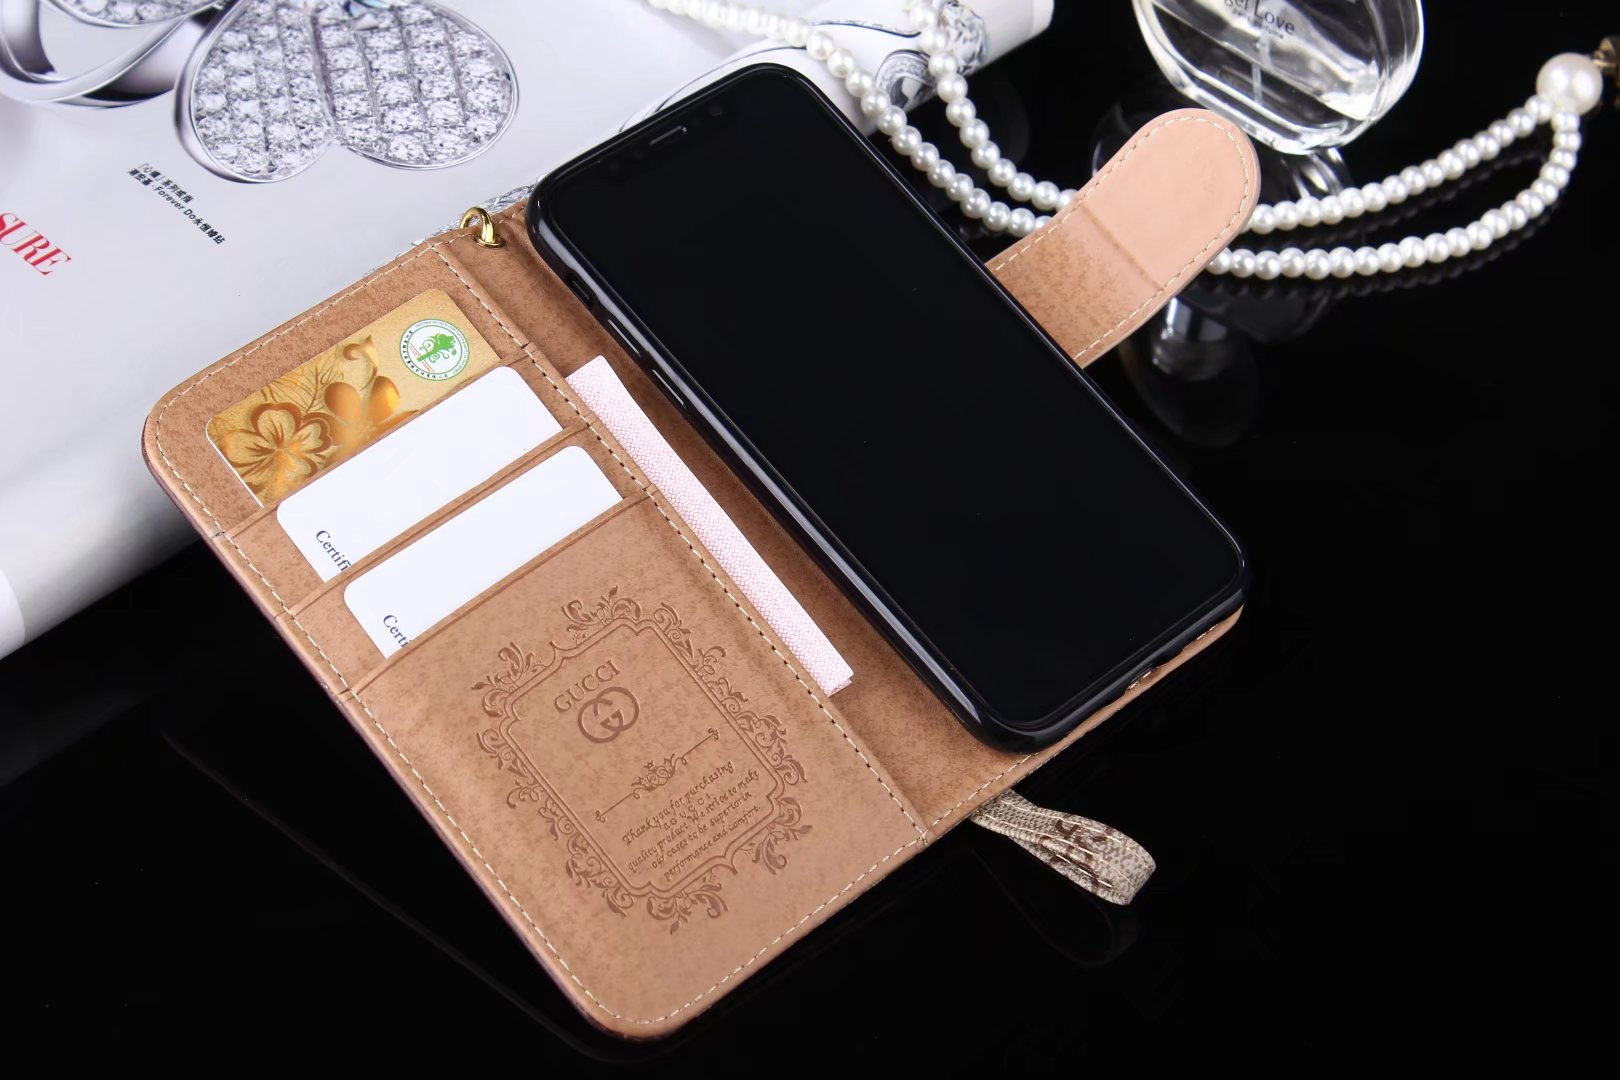 handyhülle foto iphone iphone case erstellen Louis Vuitton iphone X hüllen eigenes iphone caX erstellen gerüchte apple handyschale Xlbst gestalten iphone caX Xlber iphone caX individuell handyhülle Xlbst gestalten samsung galaxy sX